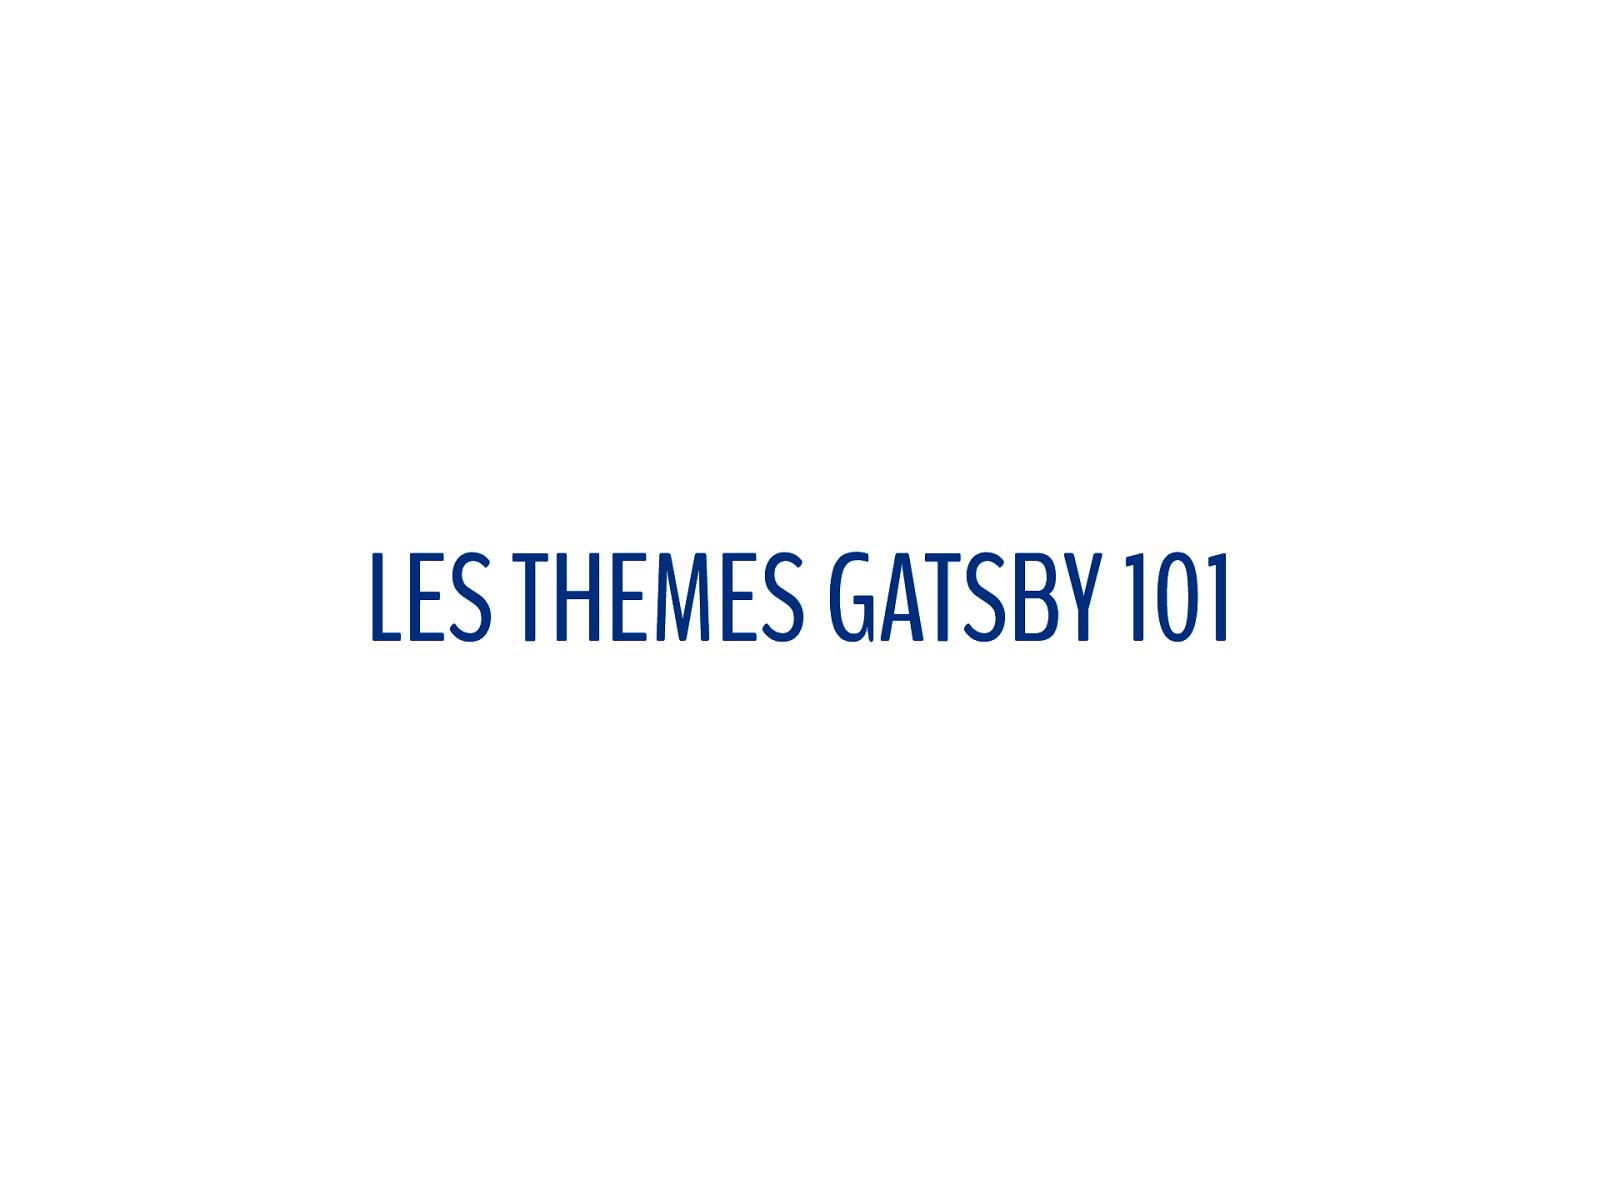 Gatsby Themes 101